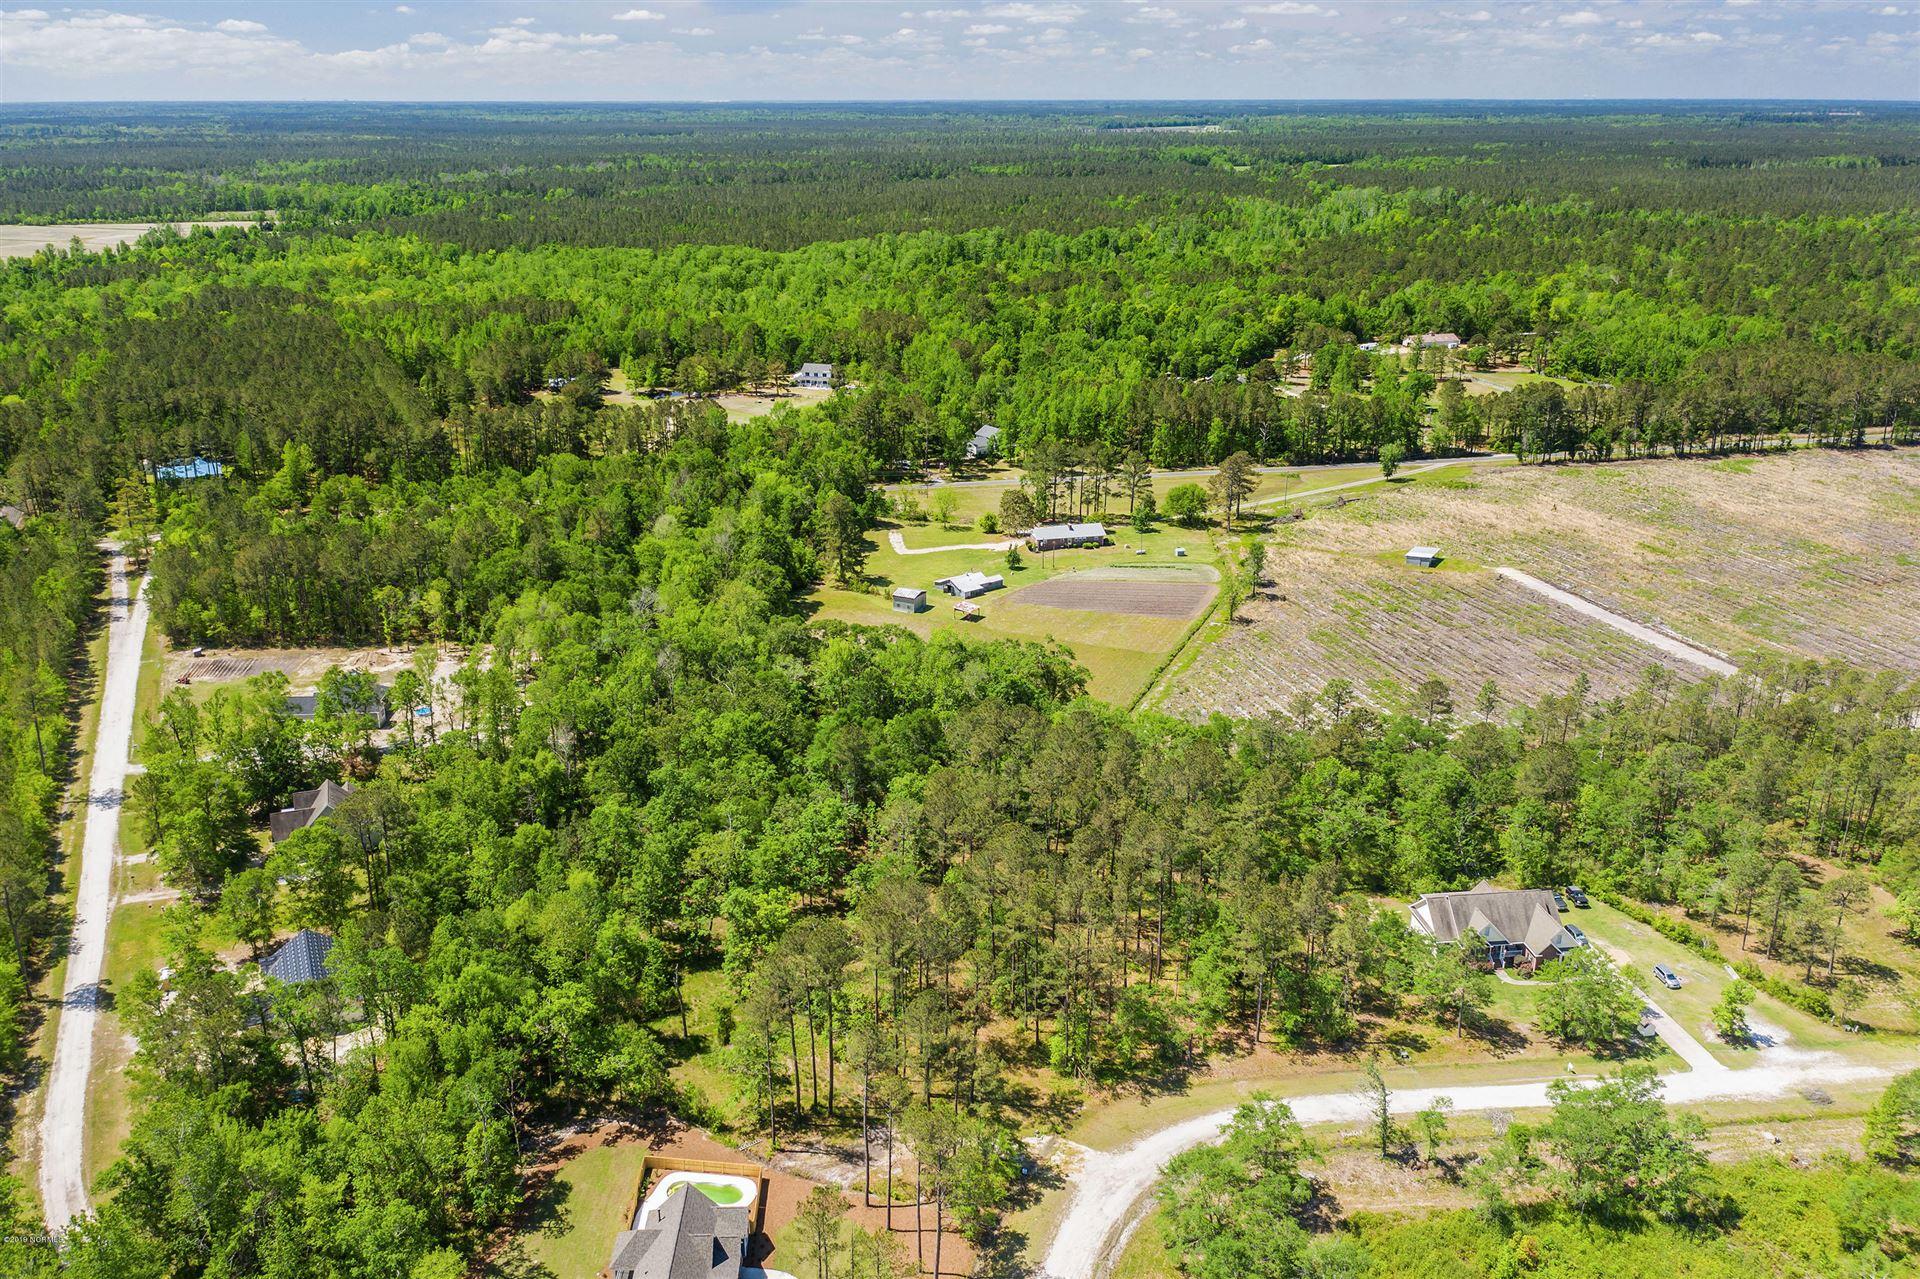 Photo of Lot 4 W Waverly Drive, Burgaw, NC 28425 (MLS # 100263780)